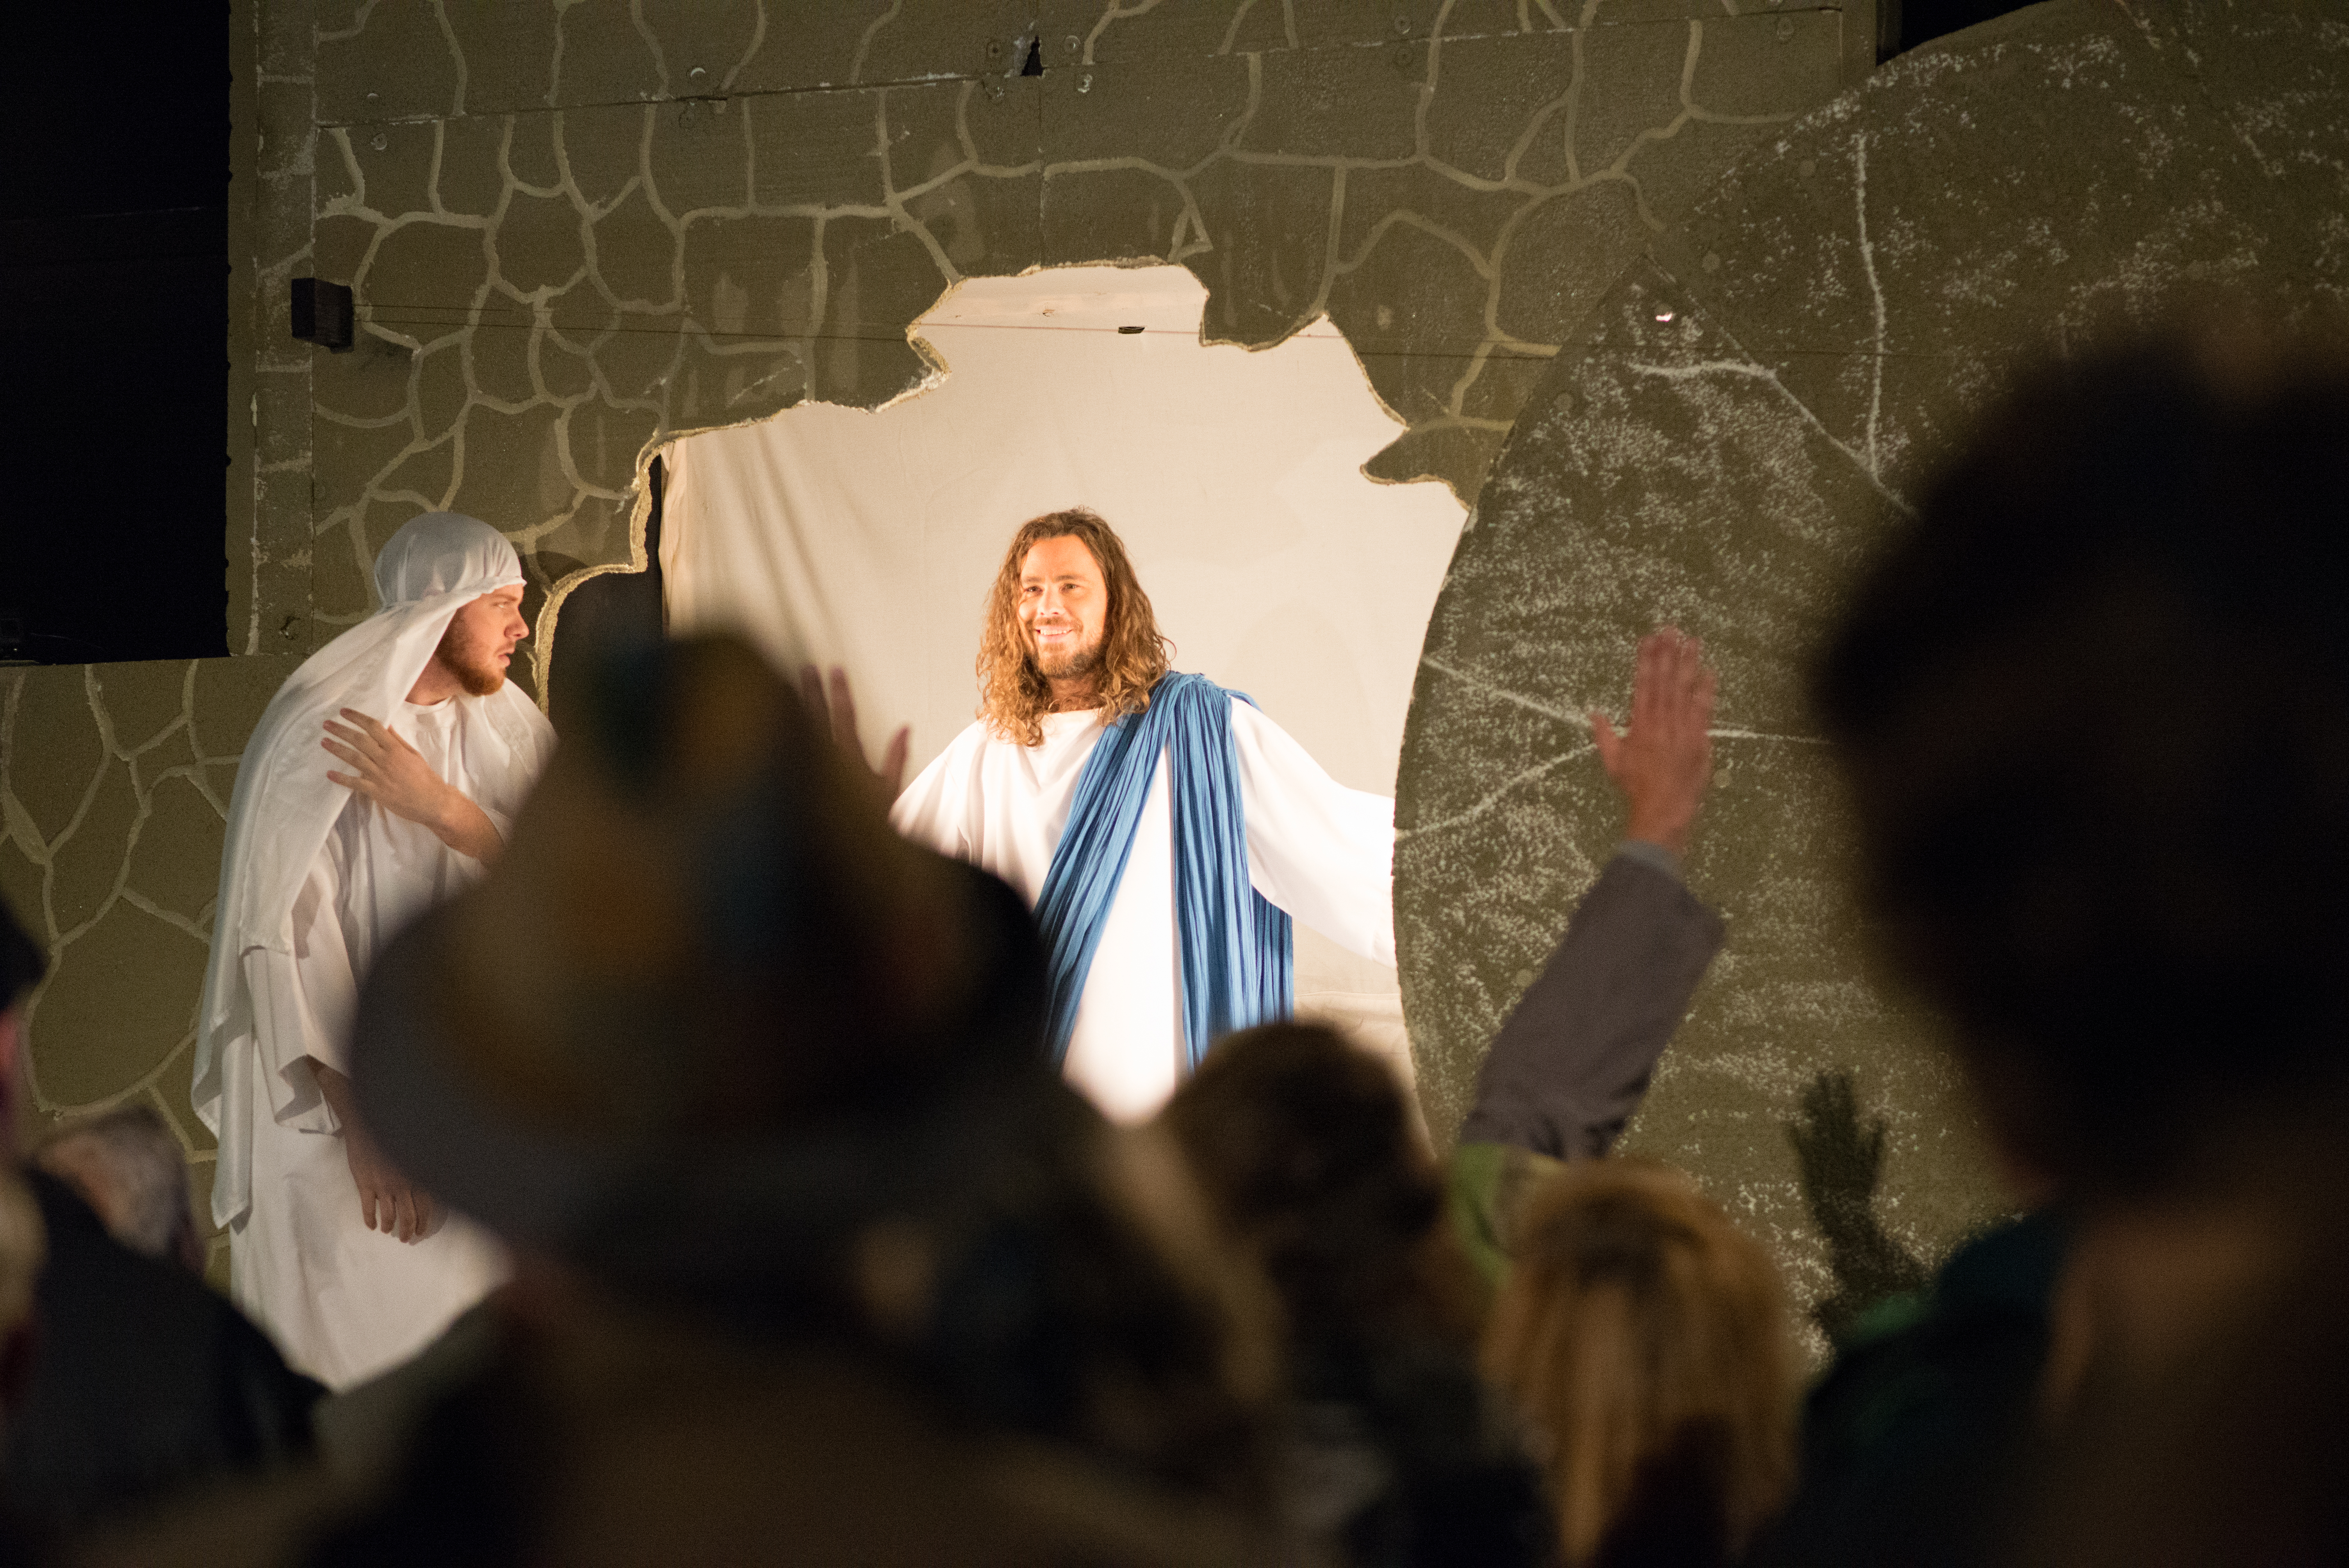 12-1-19_BethlehemLive-126